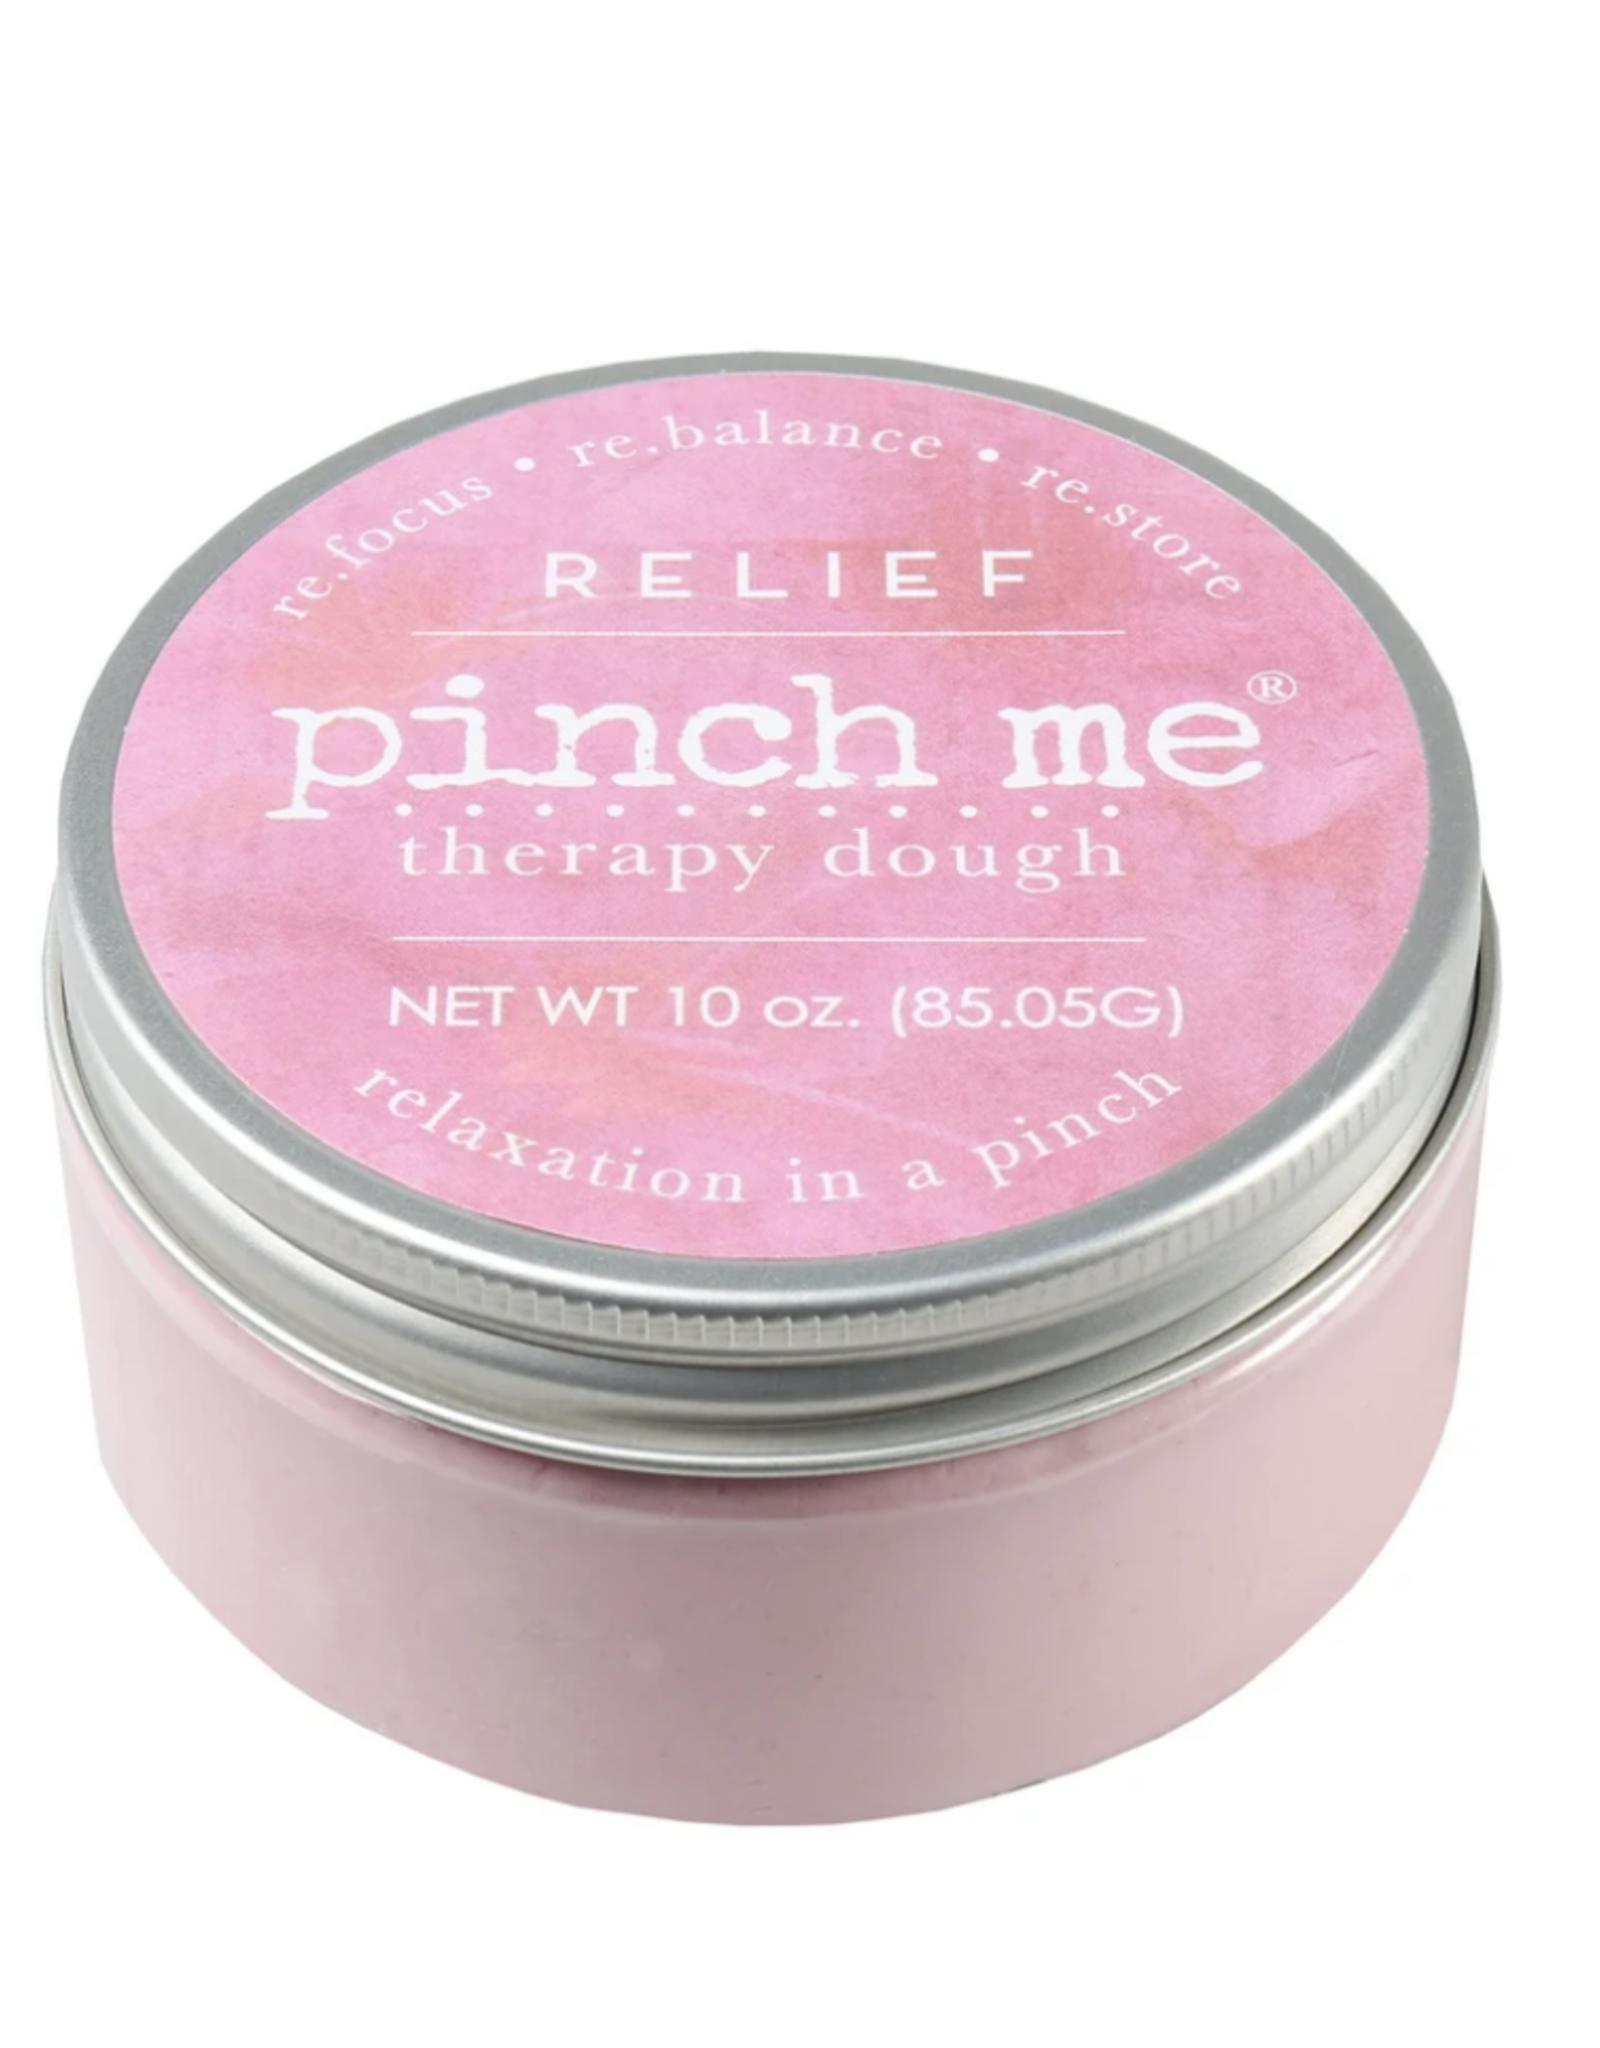 Pinch Me Therapy Dough 3oz - Reilef